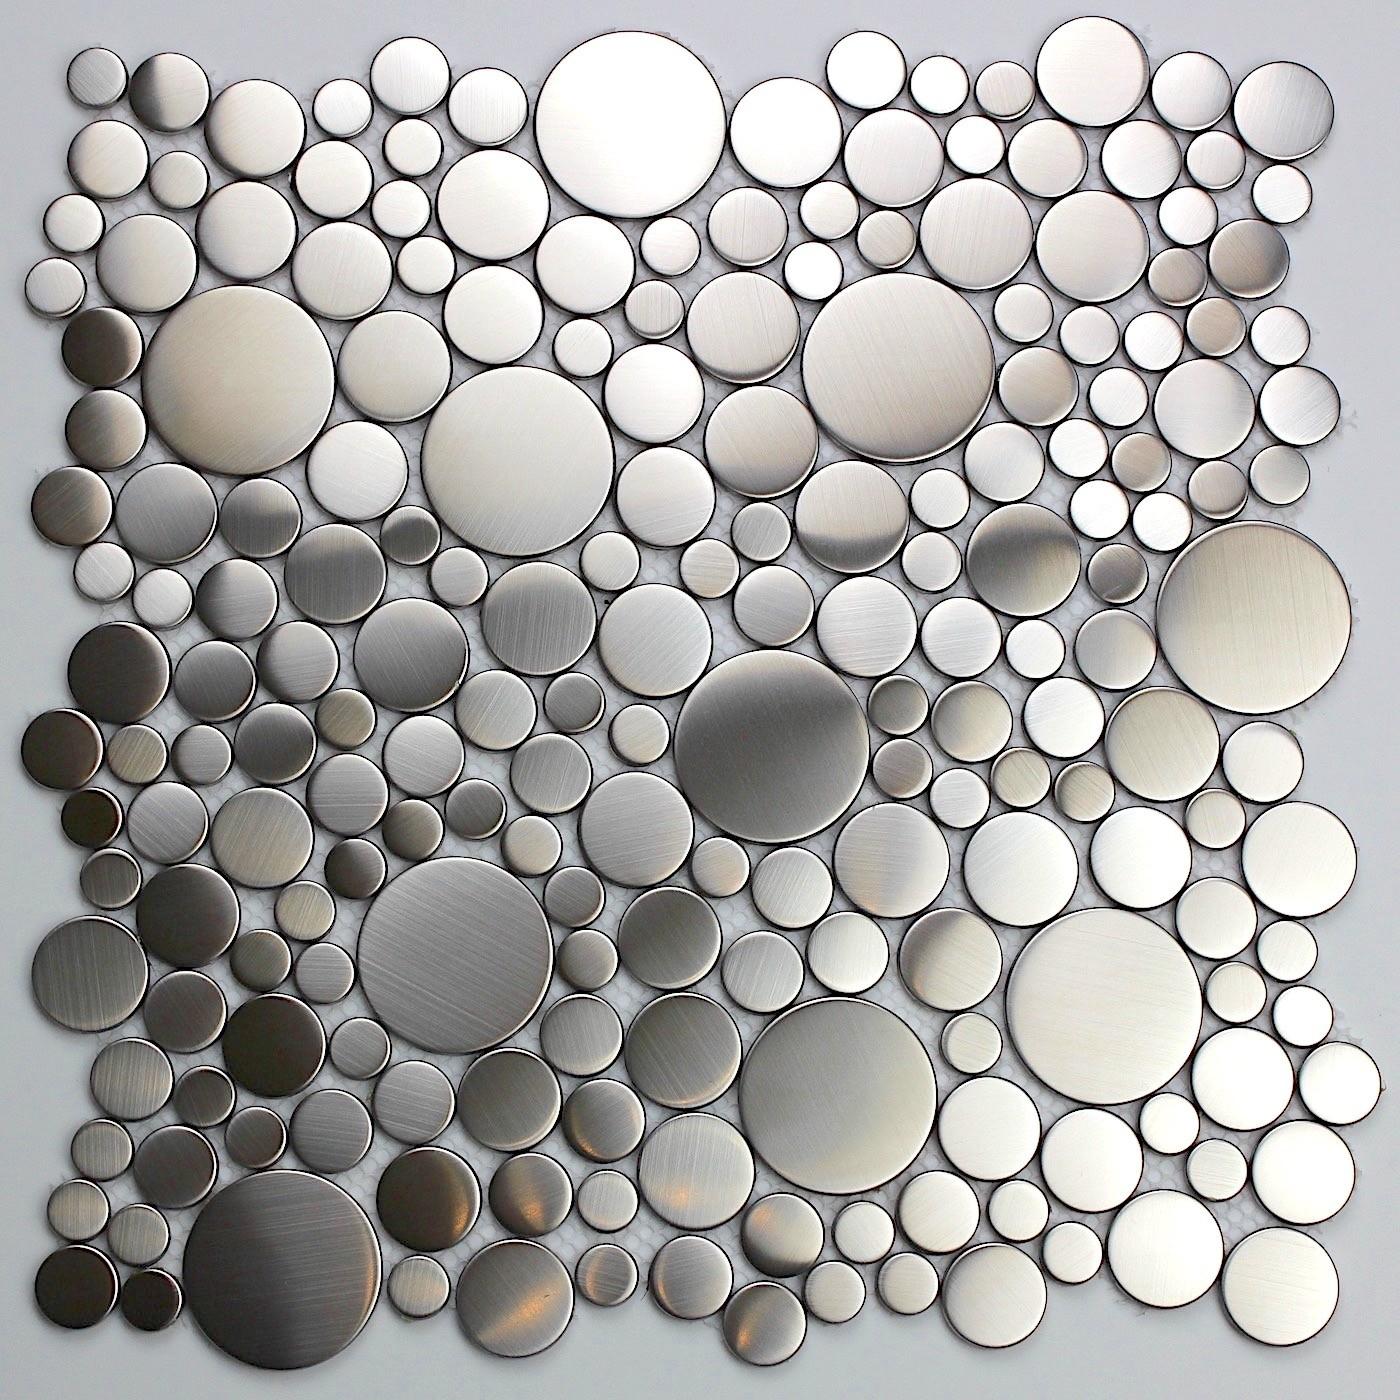 mosaic stainless steel splashback kitchen stainless steel floor